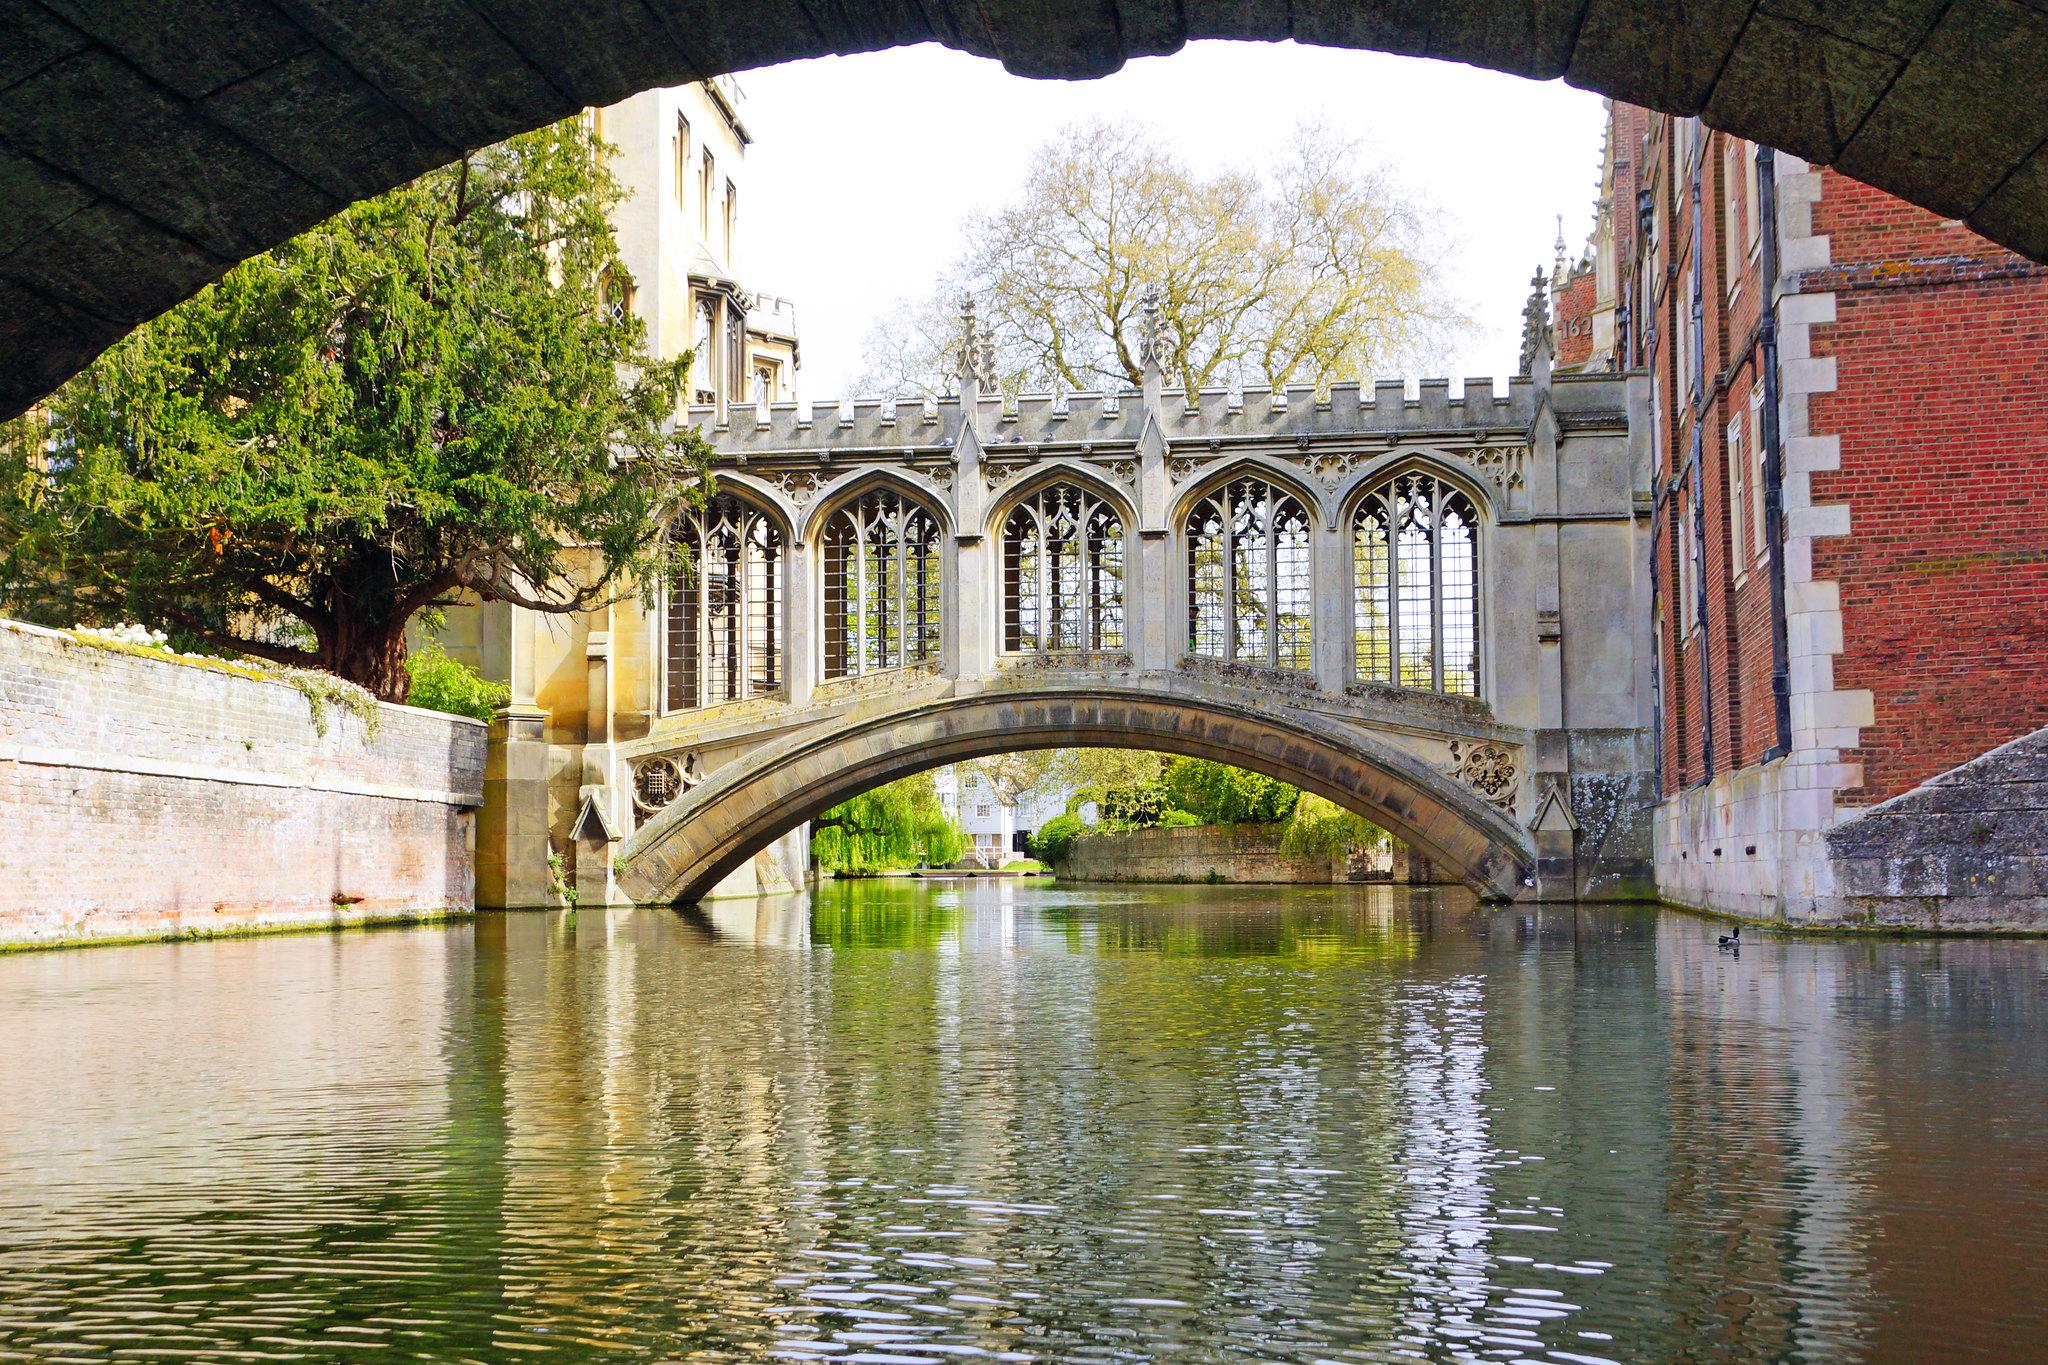 The Bridge of Sighs, Cambridge, UK [2048x1365]